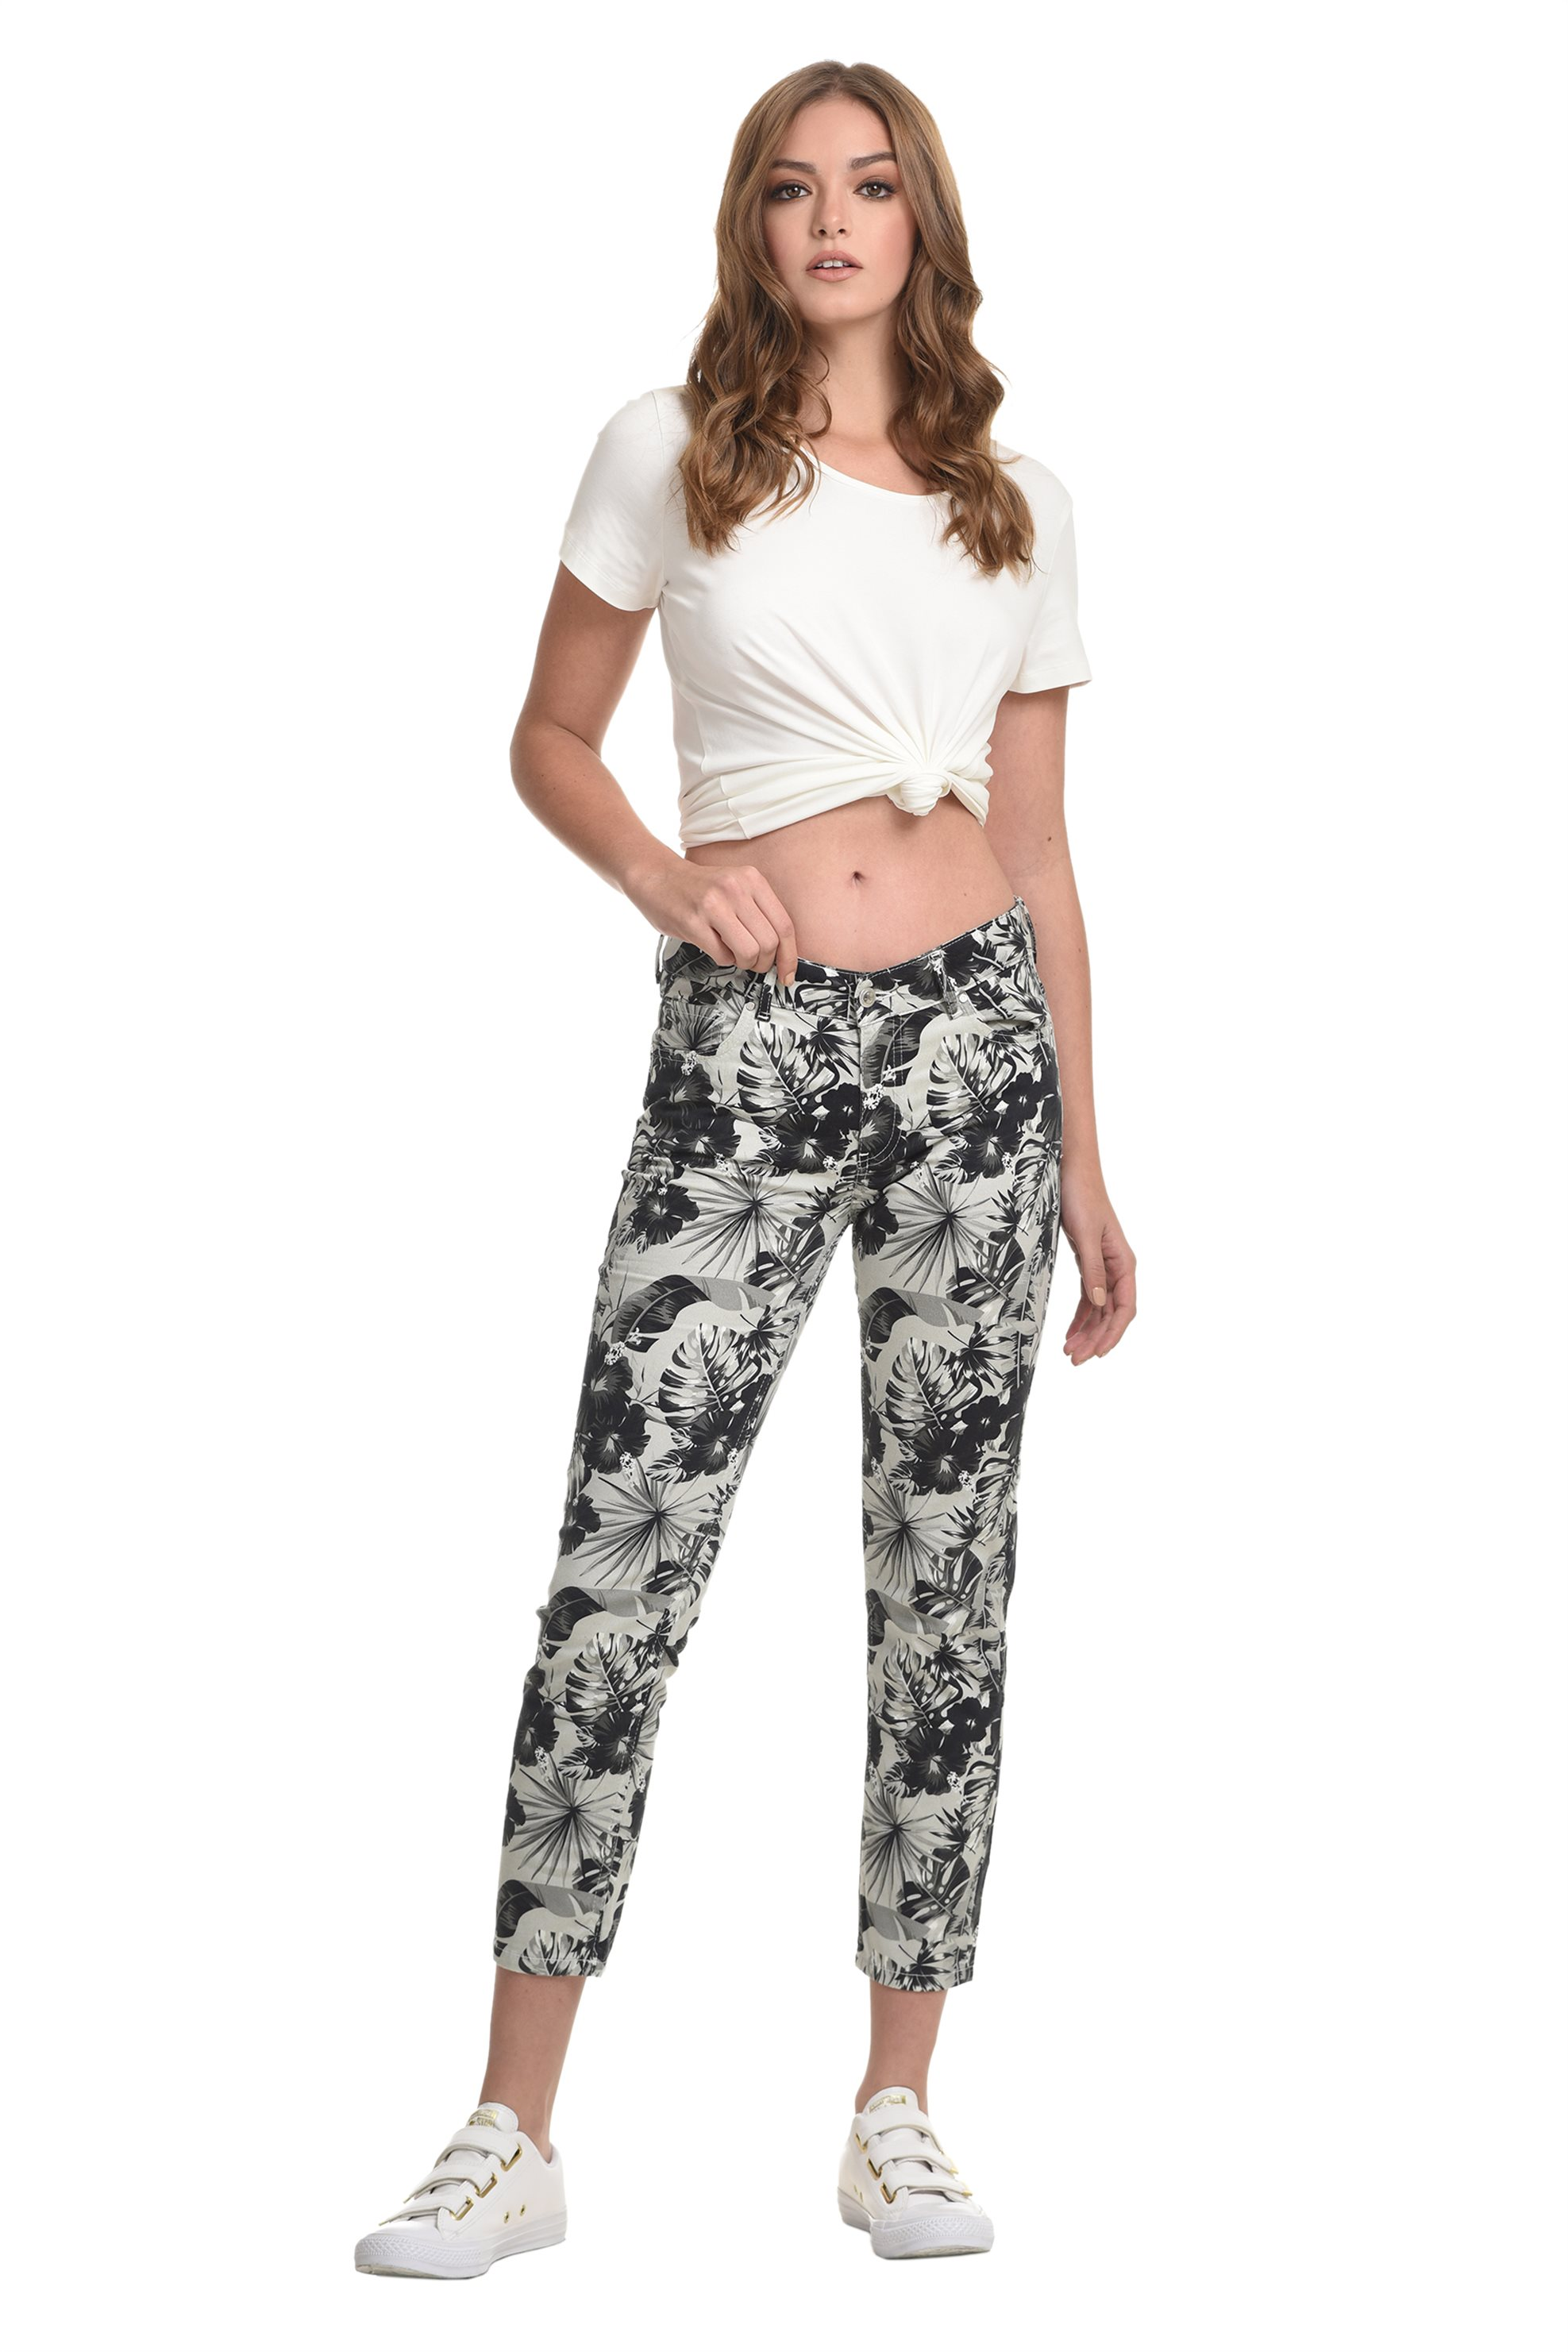 dacb0a359d8d Γυναικεία Φλοράλ Παντελόνια Online - Κορυφαία προϊόντα